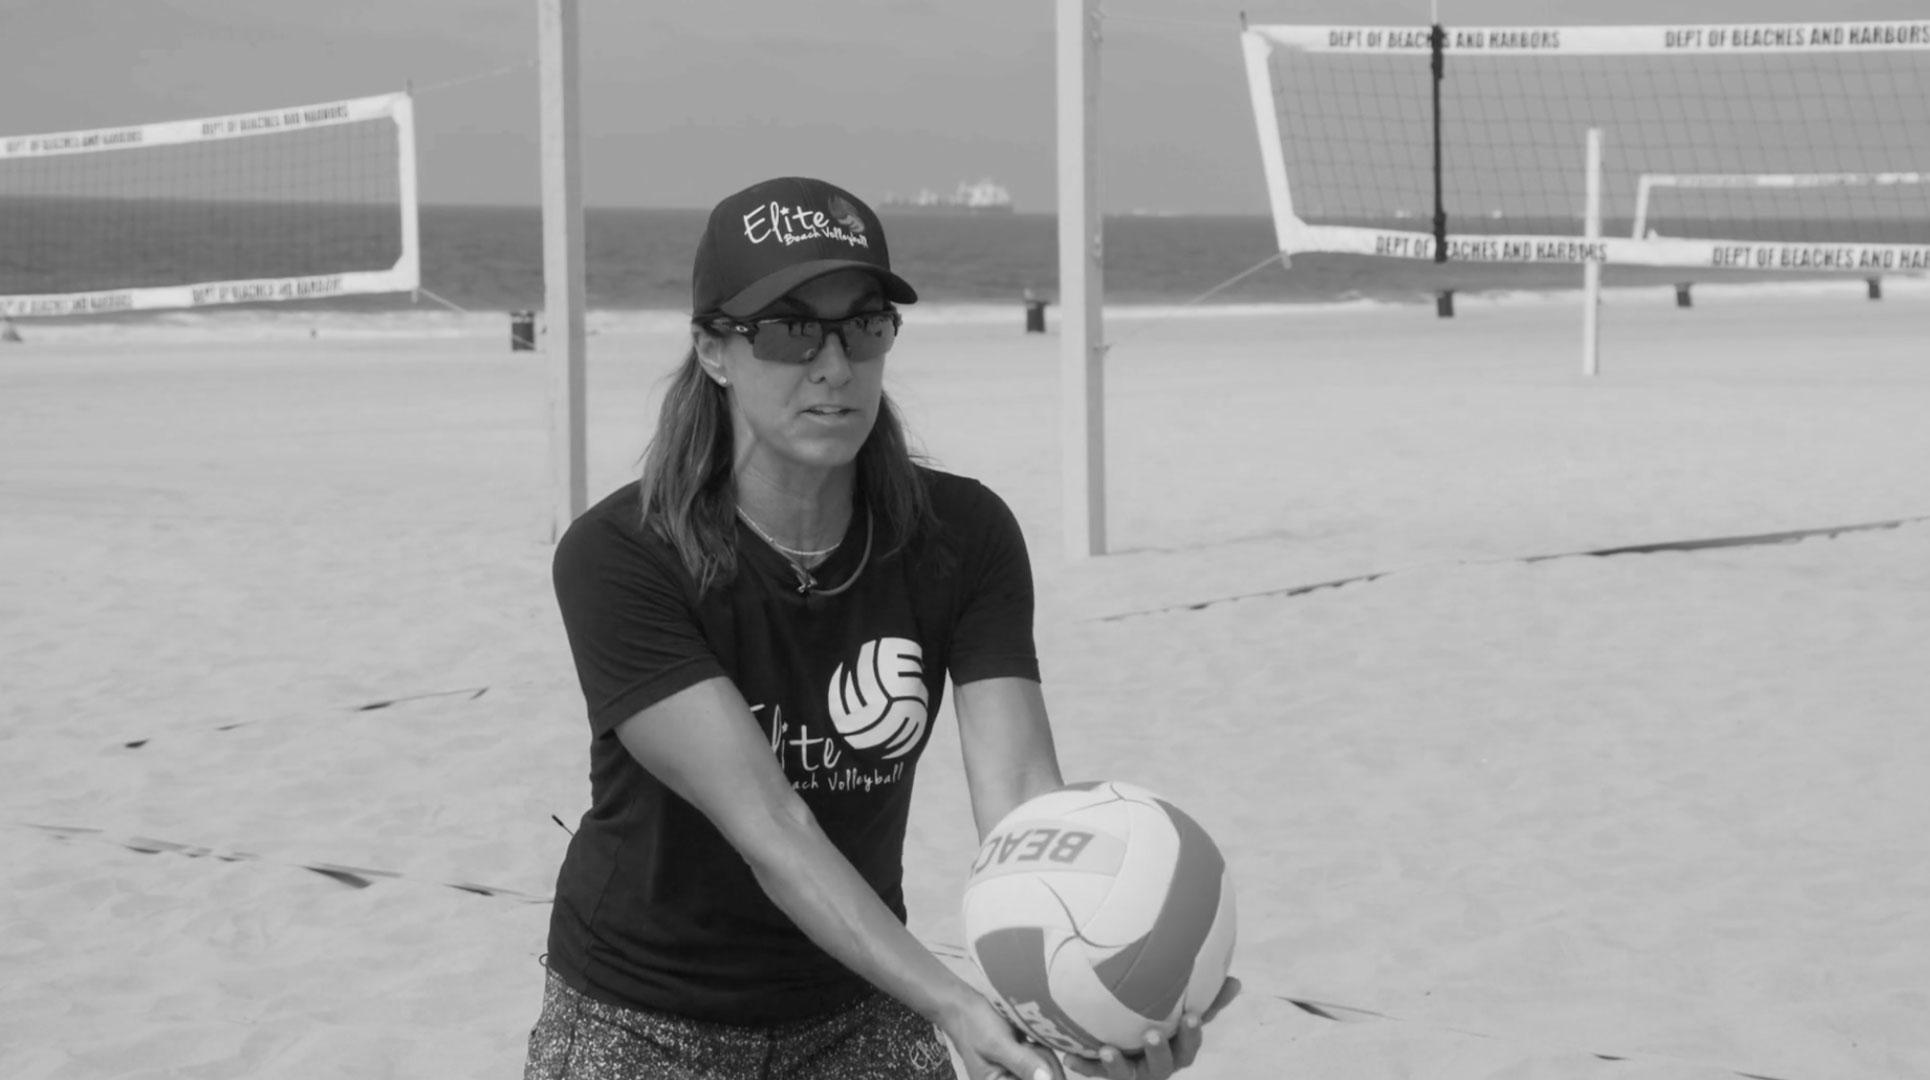 Coach Holly McPeak